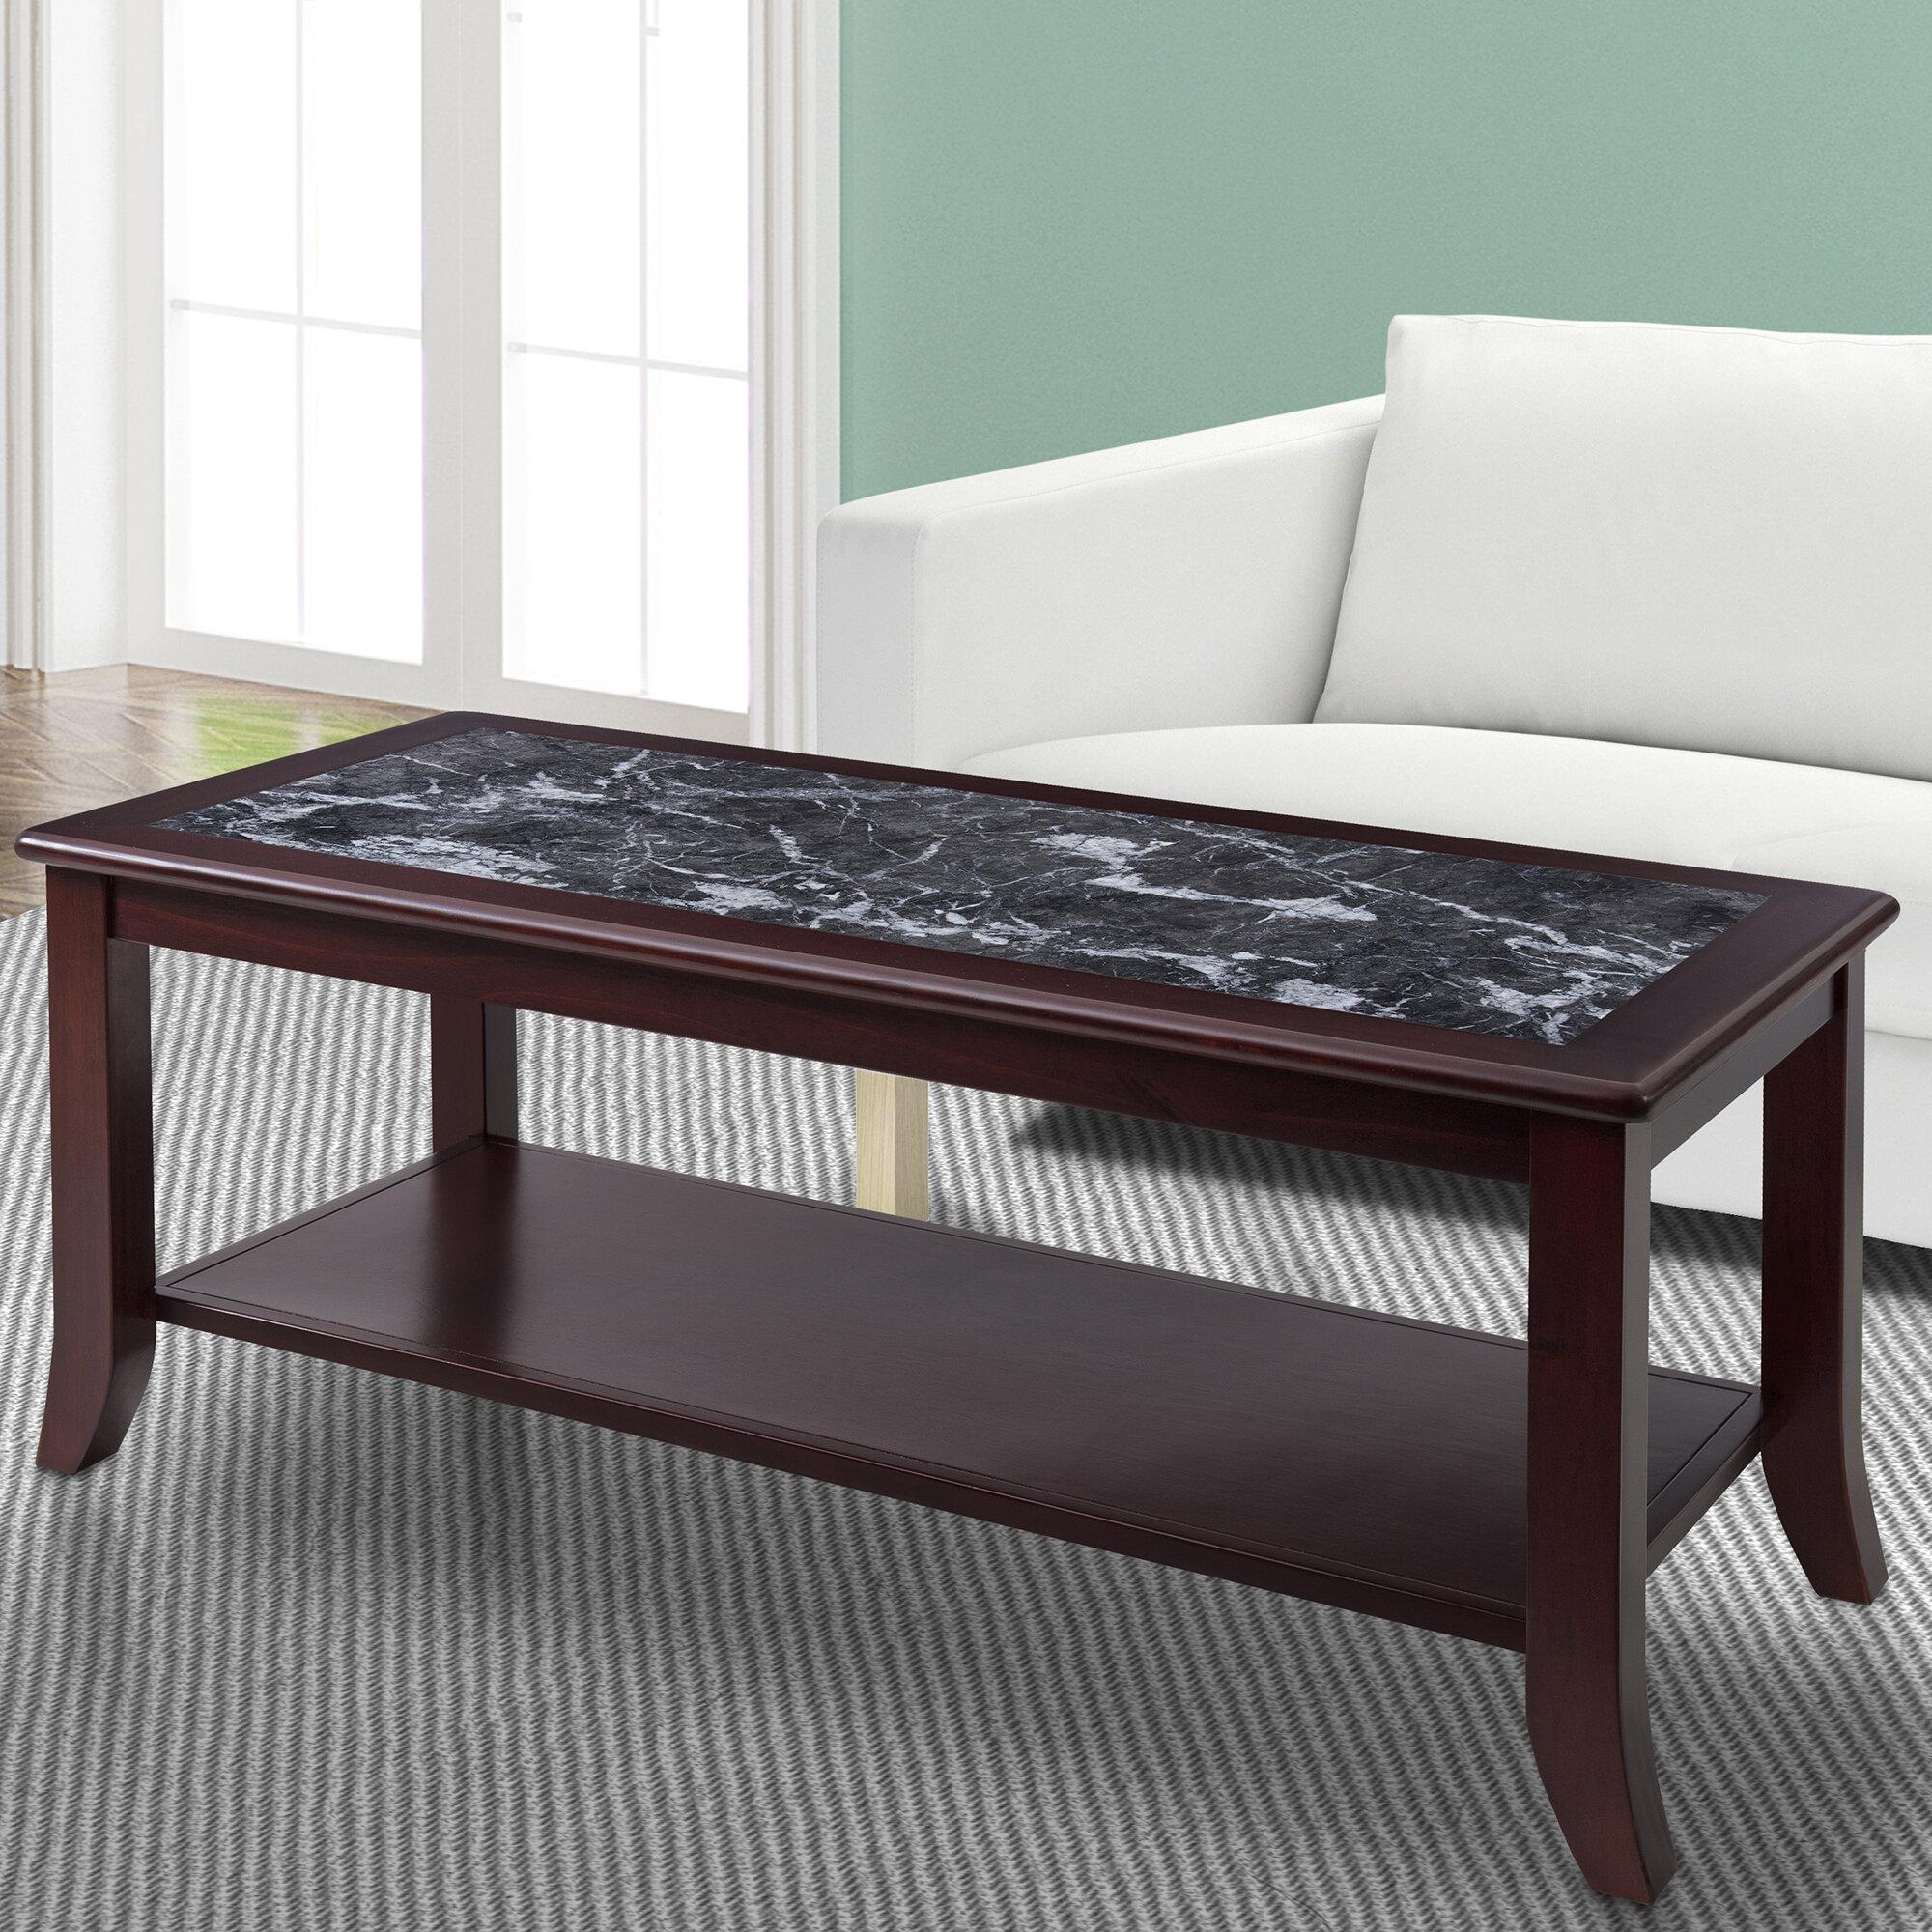 Marvelous Fenske Marble Top Coffee Table Cjindustries Chair Design For Home Cjindustriesco